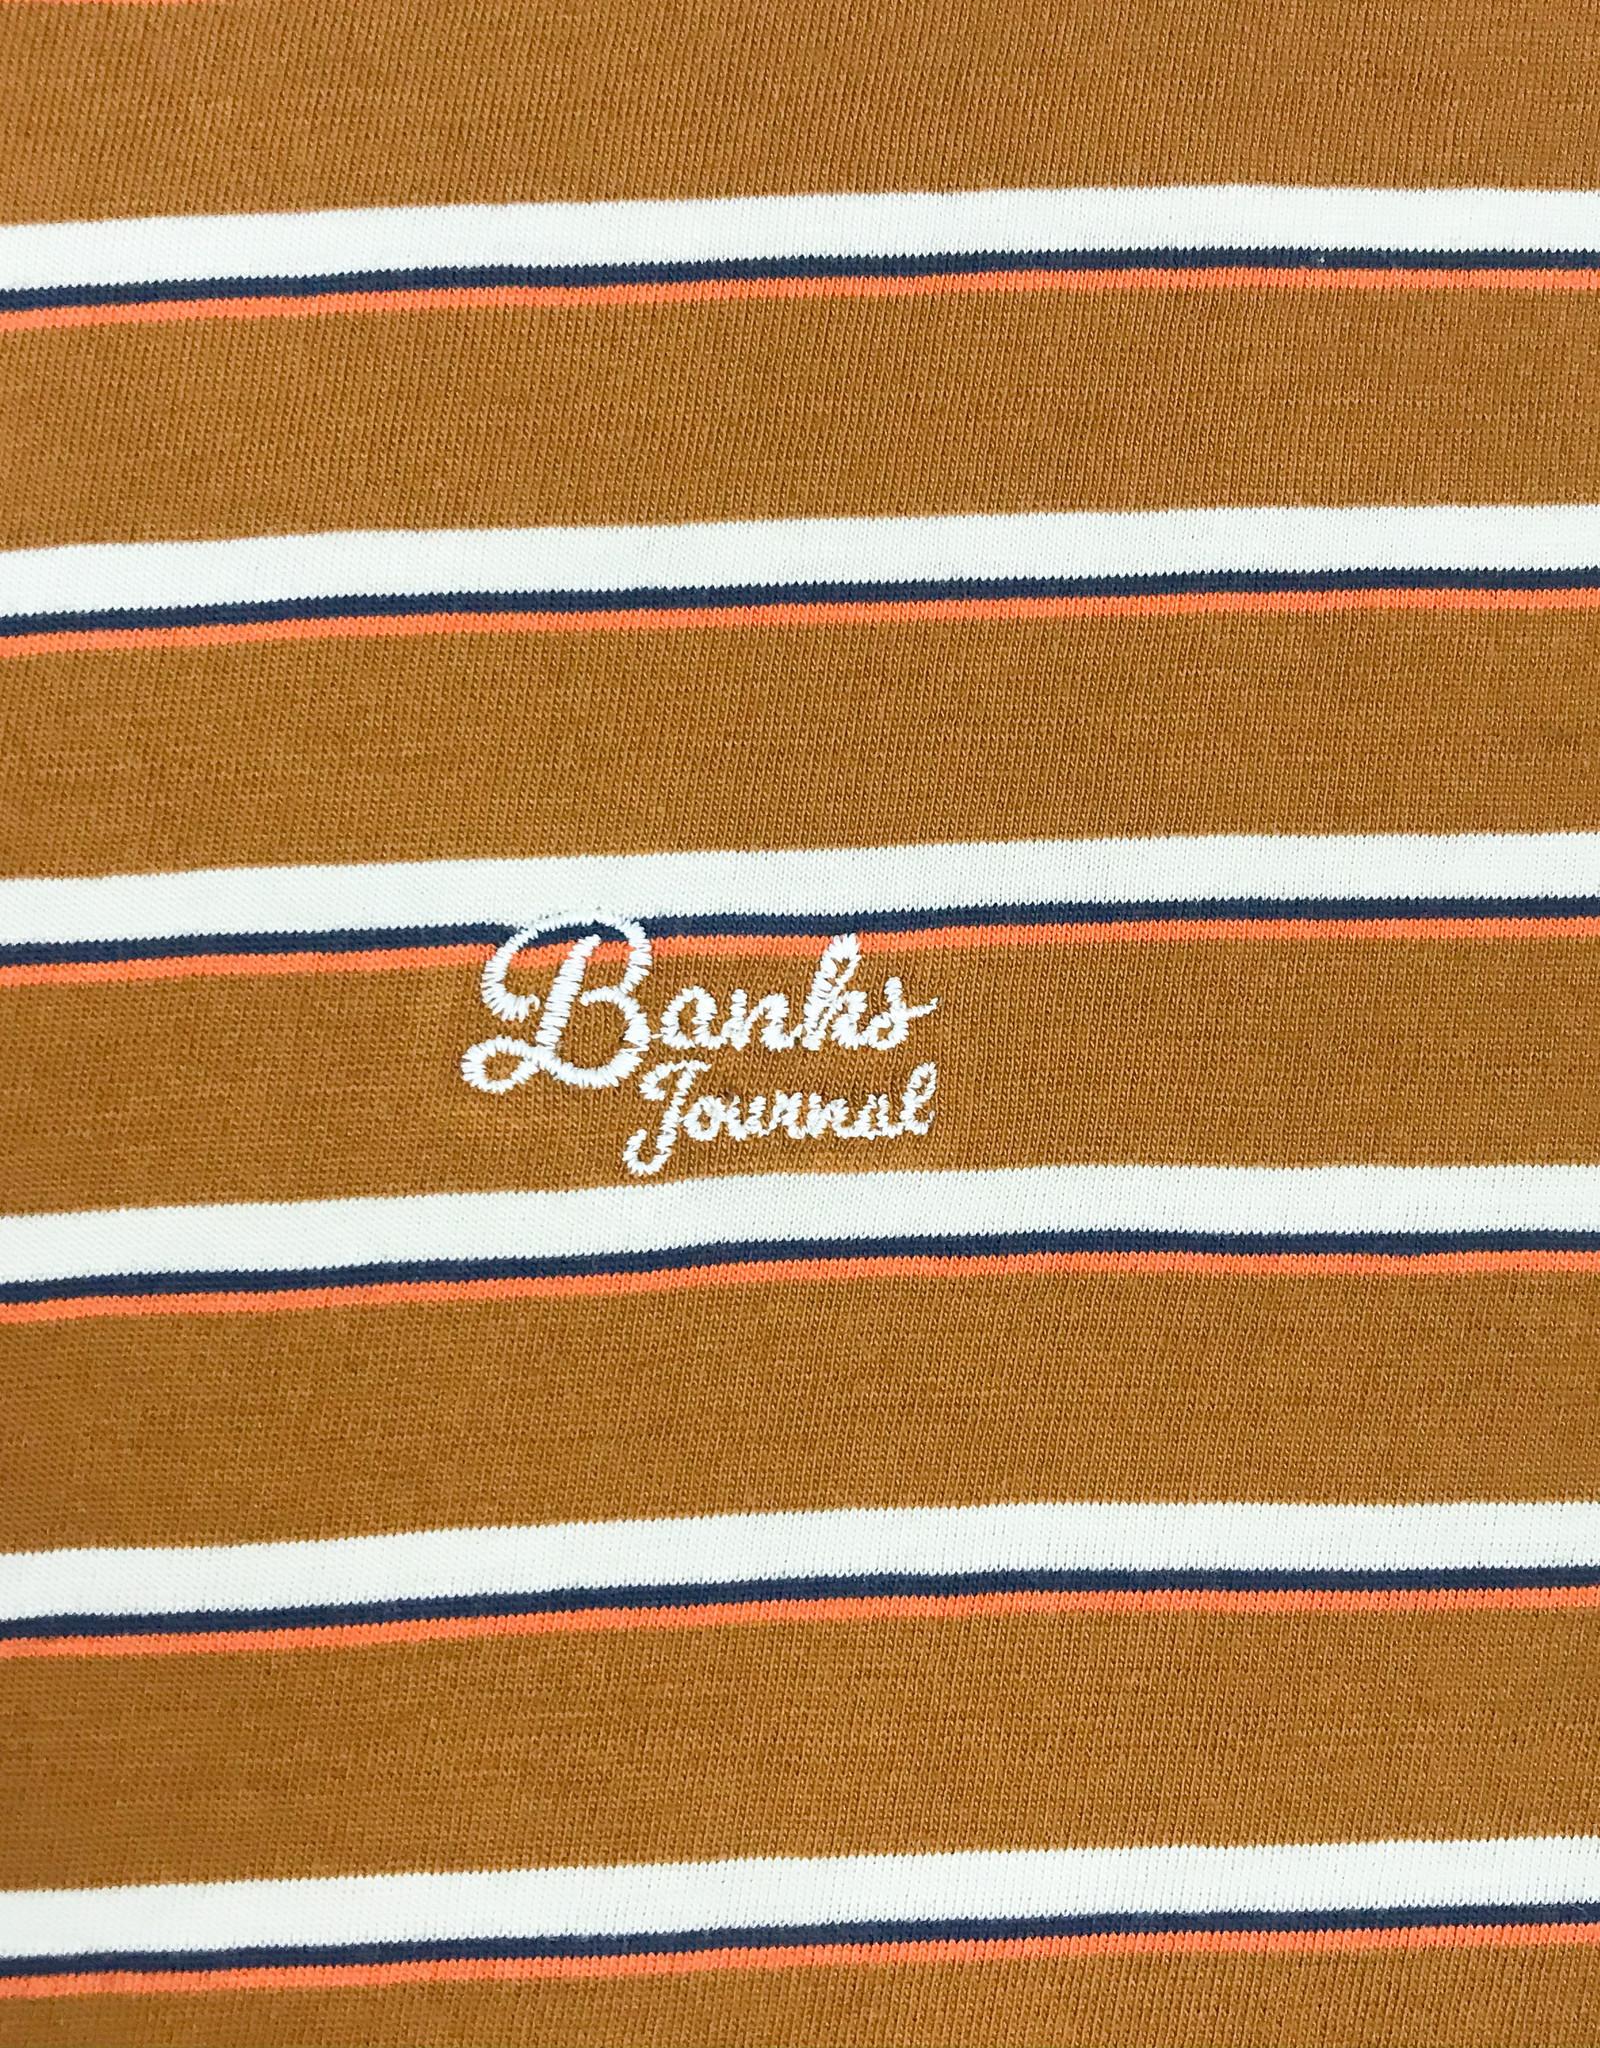 BANKS JOURNAL BANKS BILONGIL DELUXE S/S TEE - TOBACCO